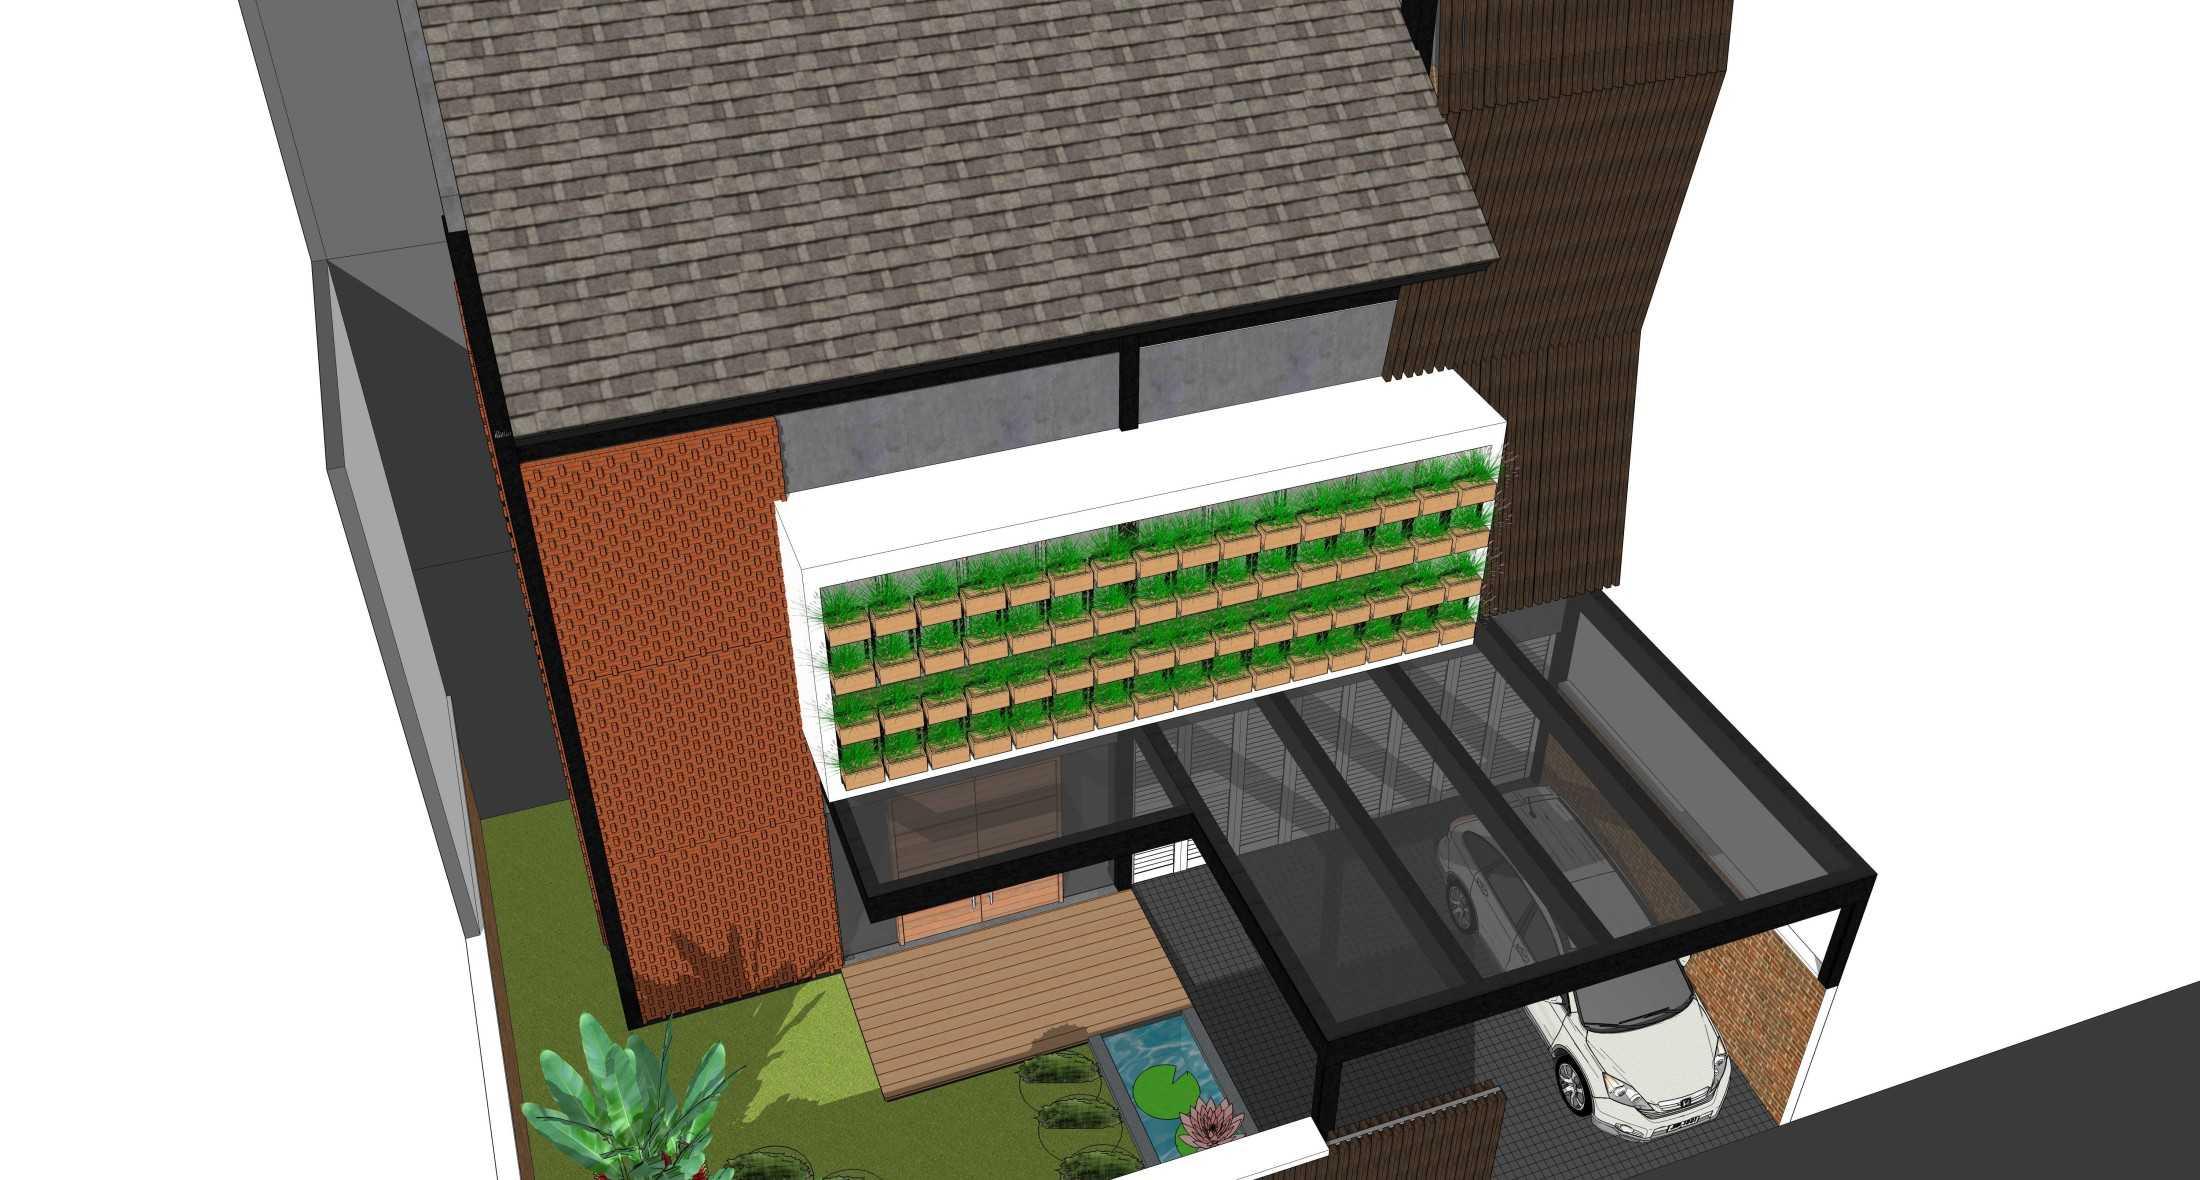 Triplus Homes Gg House Kec. Kby. Baru, Kota Jakarta Selatan, Daerah Khusus Ibukota Jakarta, Indonesia Kec. Kby. Baru, Kota Jakarta Selatan, Daerah Khusus Ibukota Jakarta, Indonesia Triplus-Homes-Gg-House  103301